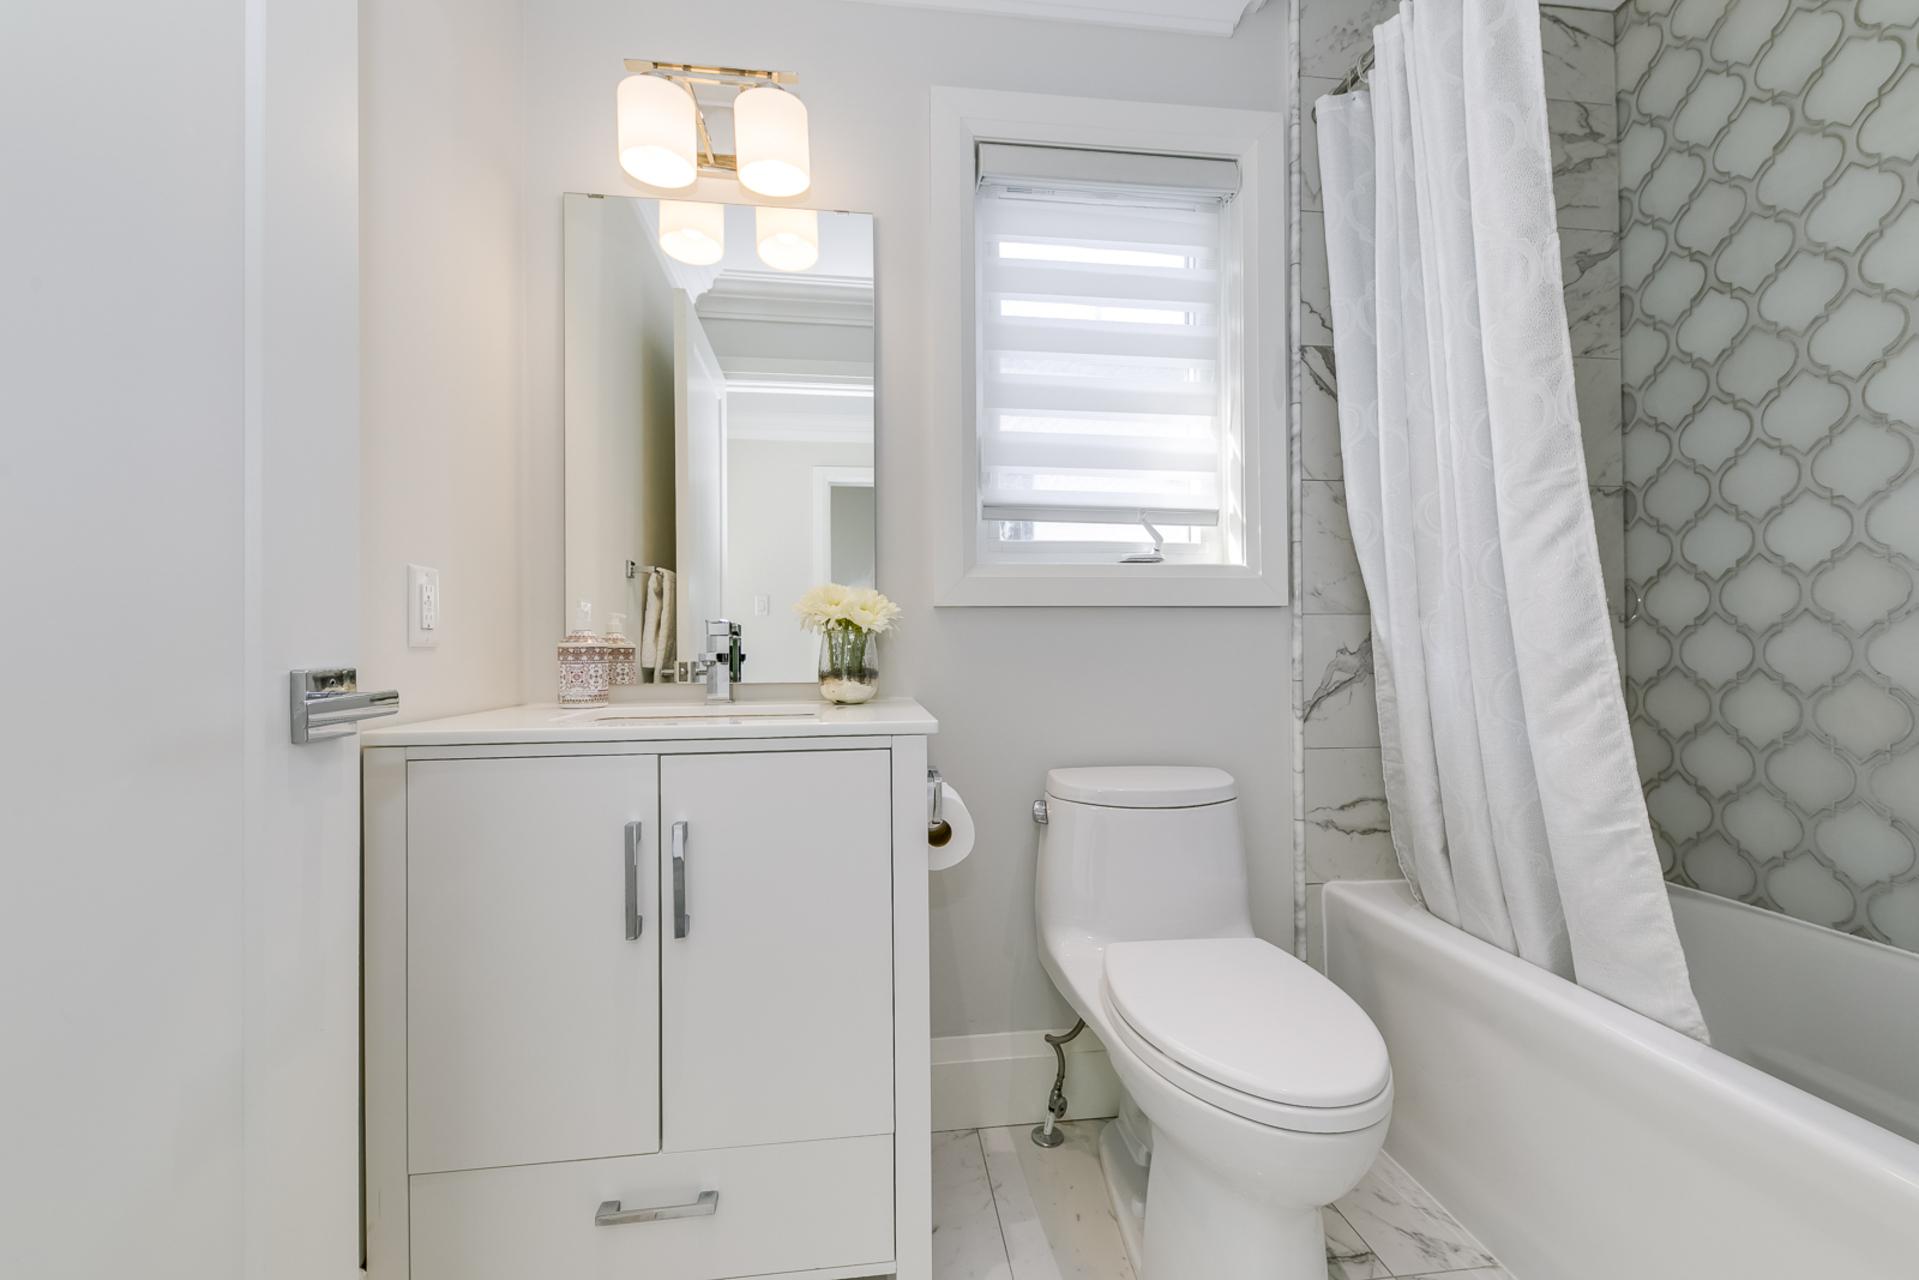 2nd Bedroom Ensuite - 729 Byngmount Ave, Mississauga - Elite3 & Team at 729 Byngmount Avenue, Lakeview, Mississauga